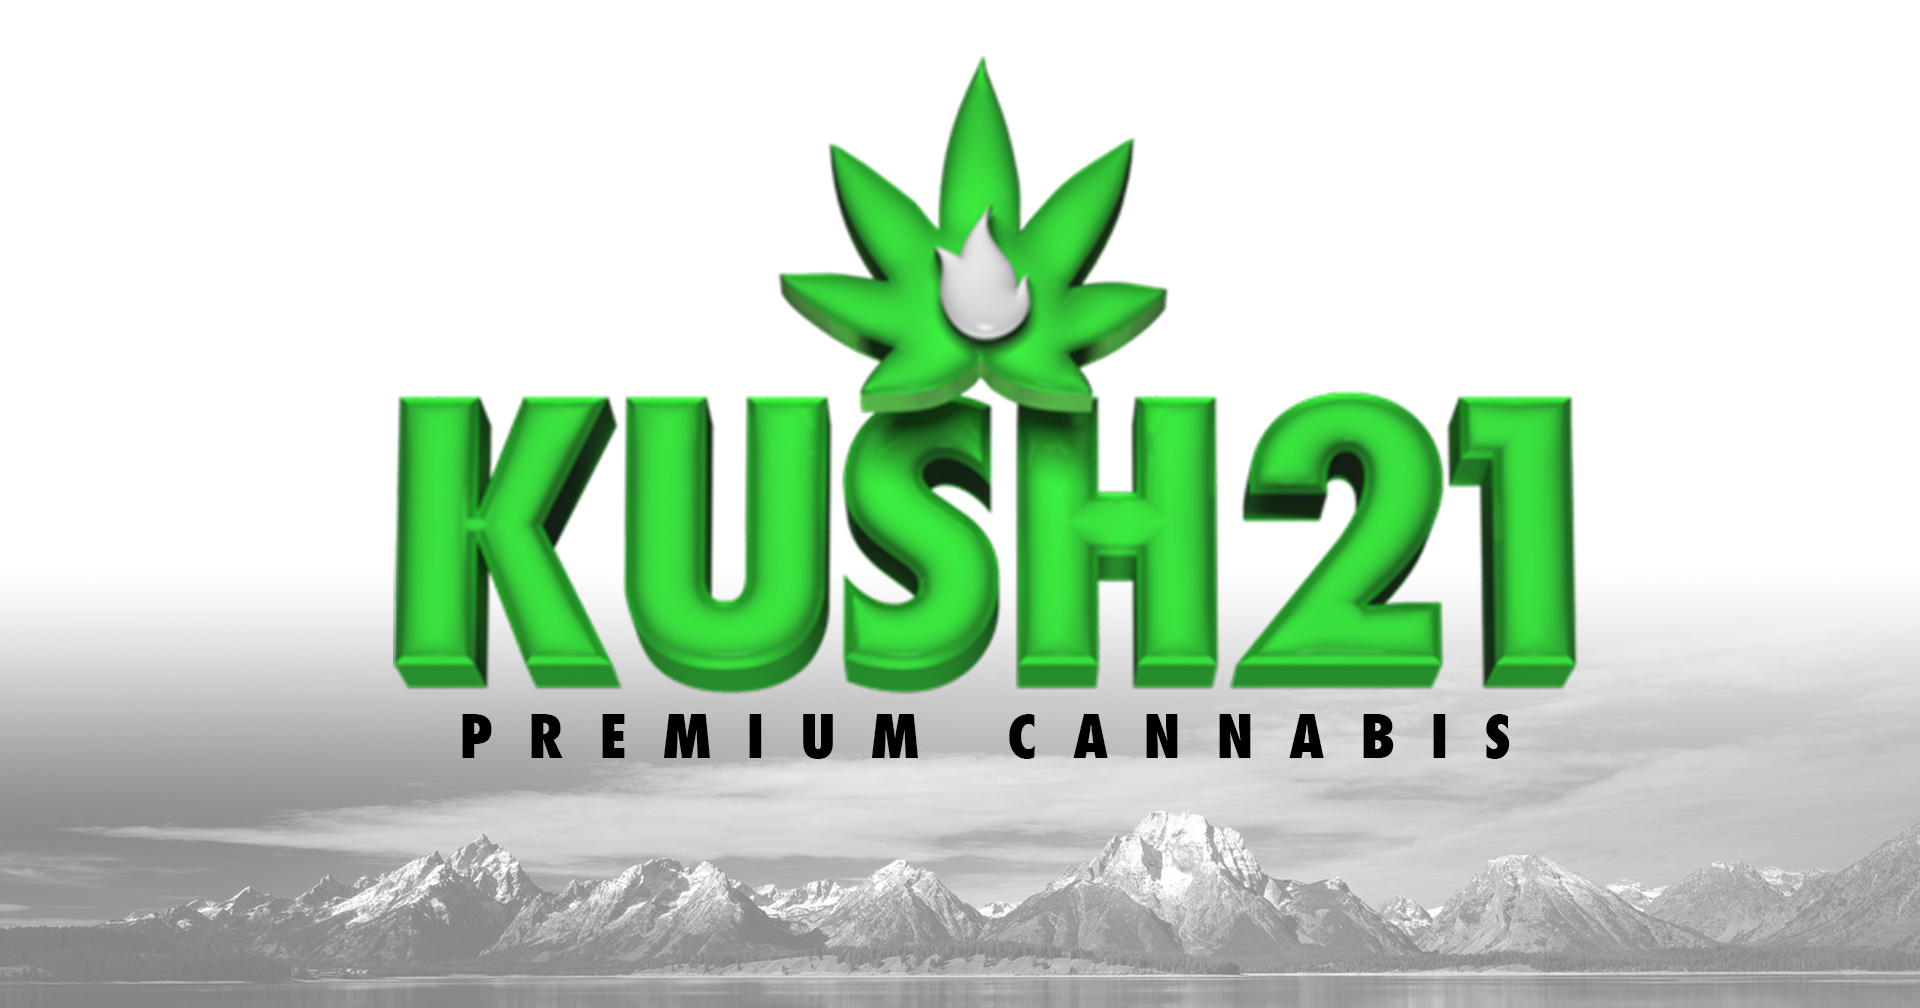 Kush21 | Seatac Burien Recreational Cannabis Dispensary